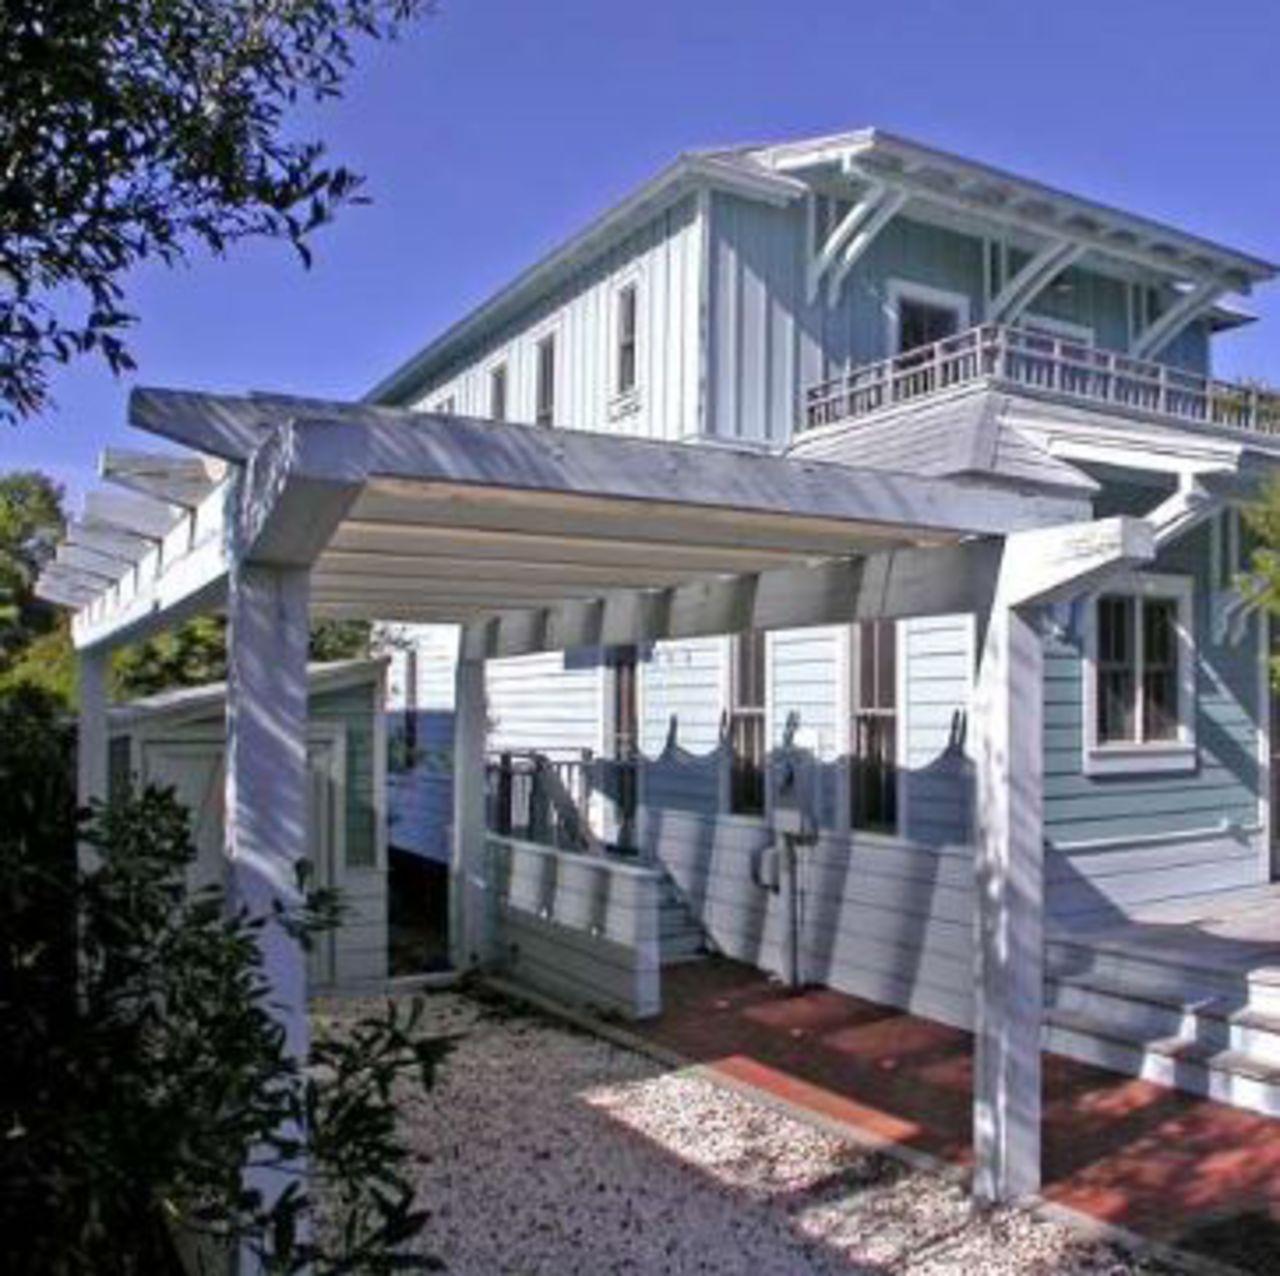 Beach House Rentals In Panama City Beach: Hotel, Florida: Panama City Beach Homes & Condos